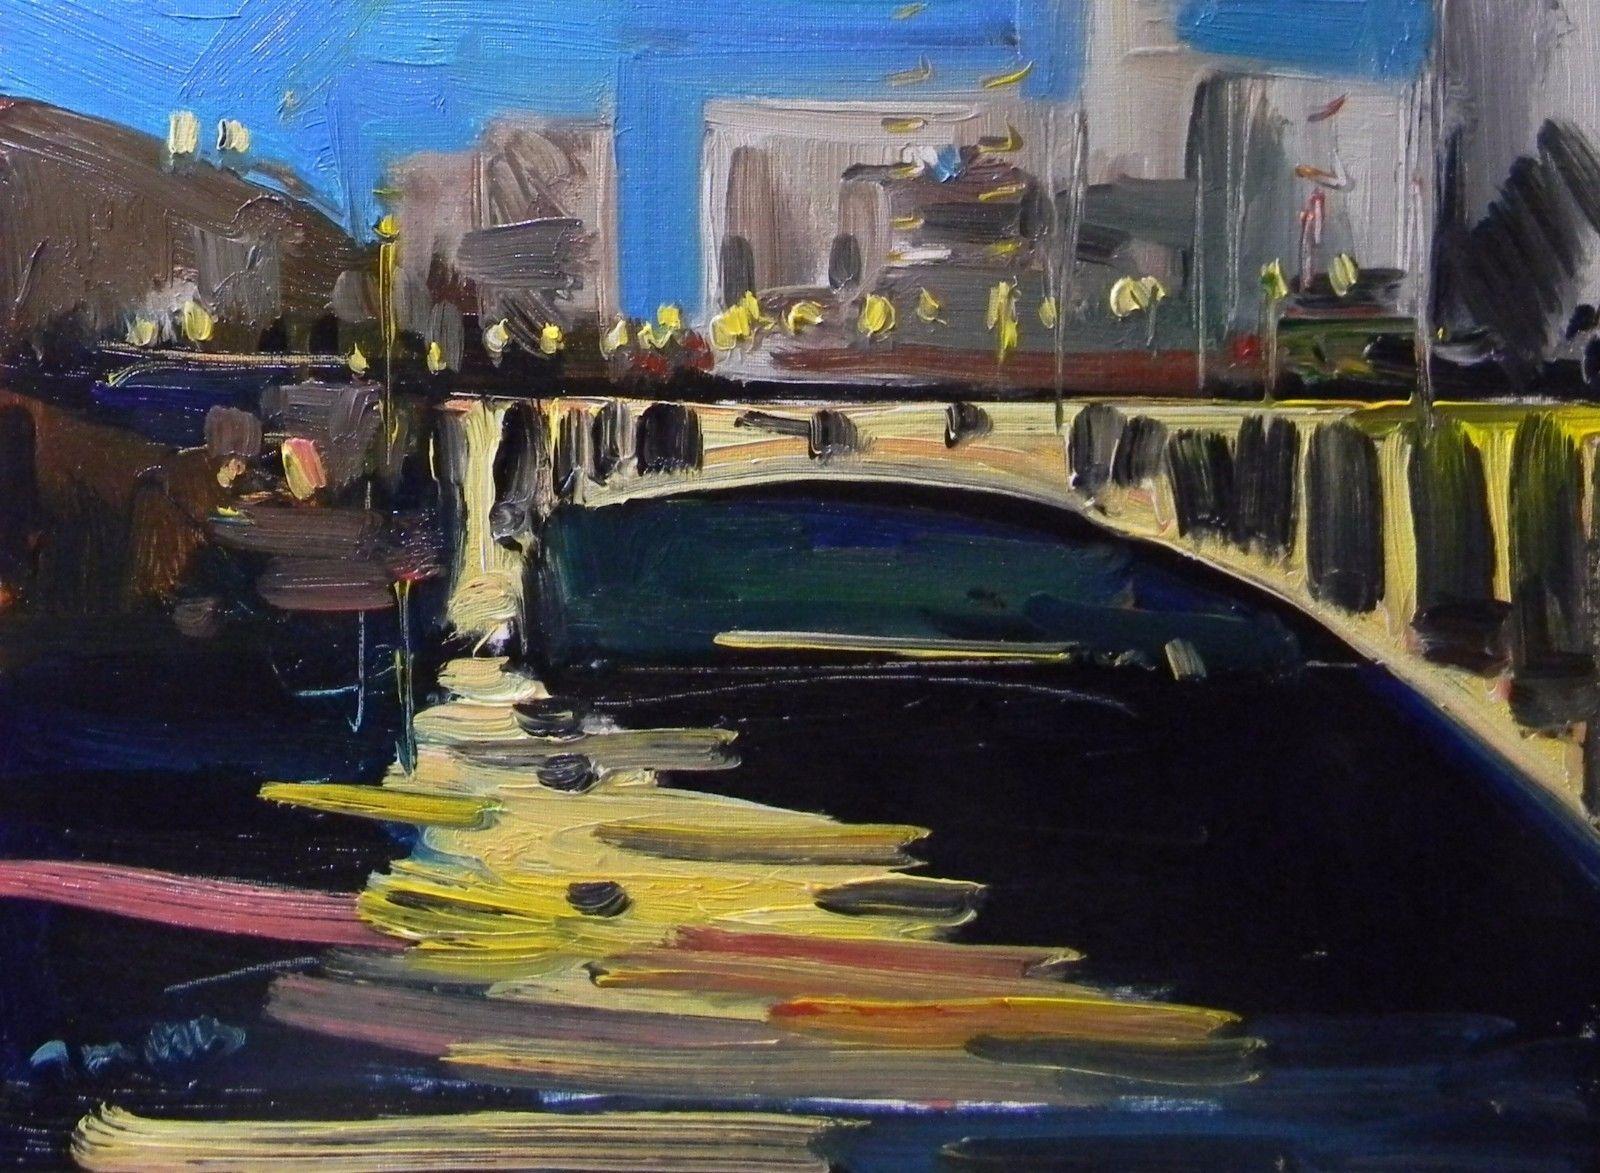 JOSE TRUJILLO Oil Painting Bridge Night City Buildings Lights Water Impressionis https://t.co/M0356ED03x https://t.co/EzQo4izvn3